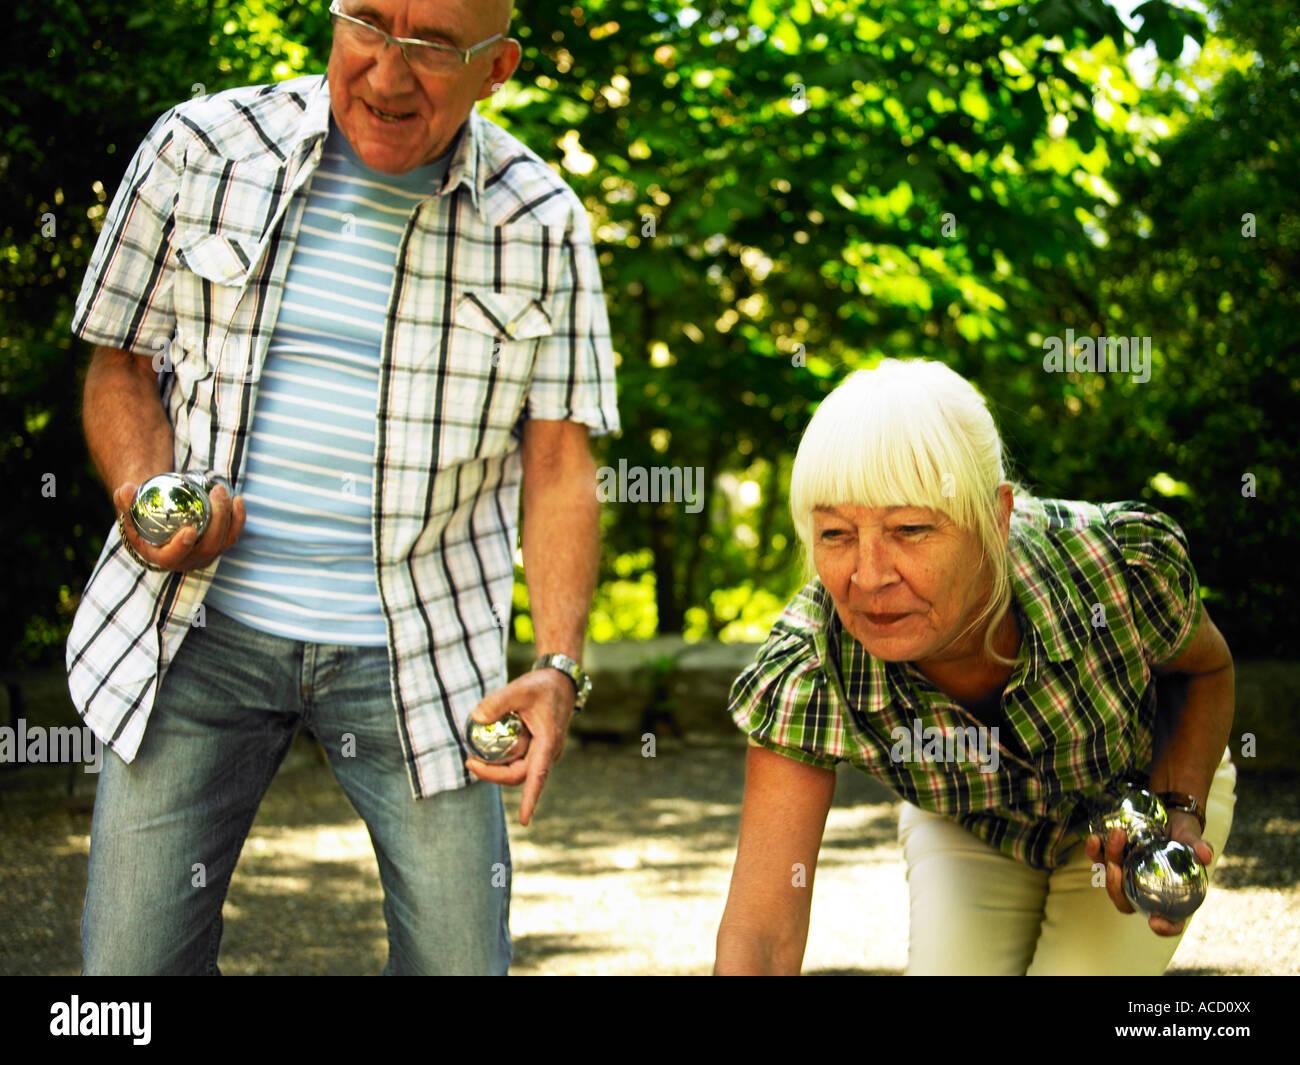 Senior citizen playing boule. - Stock Image